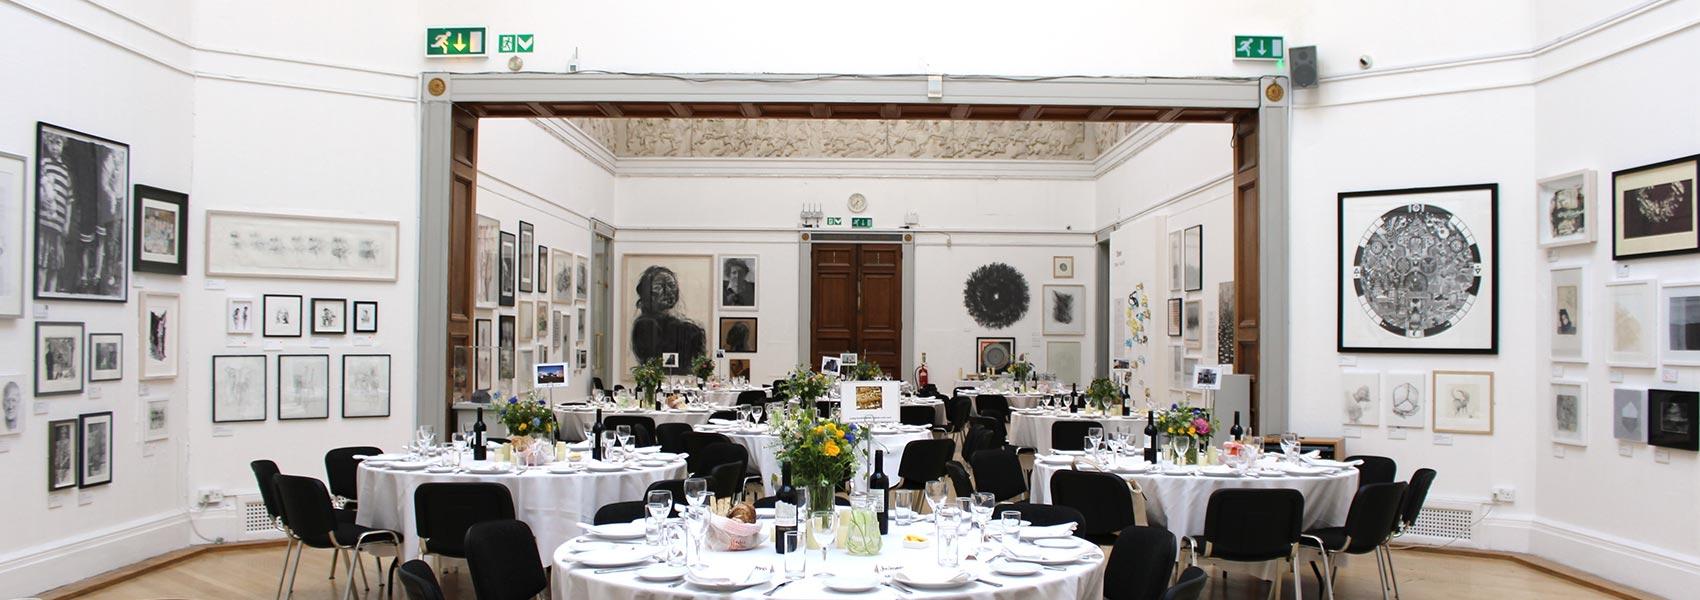 RWA Bristol Dinner Event